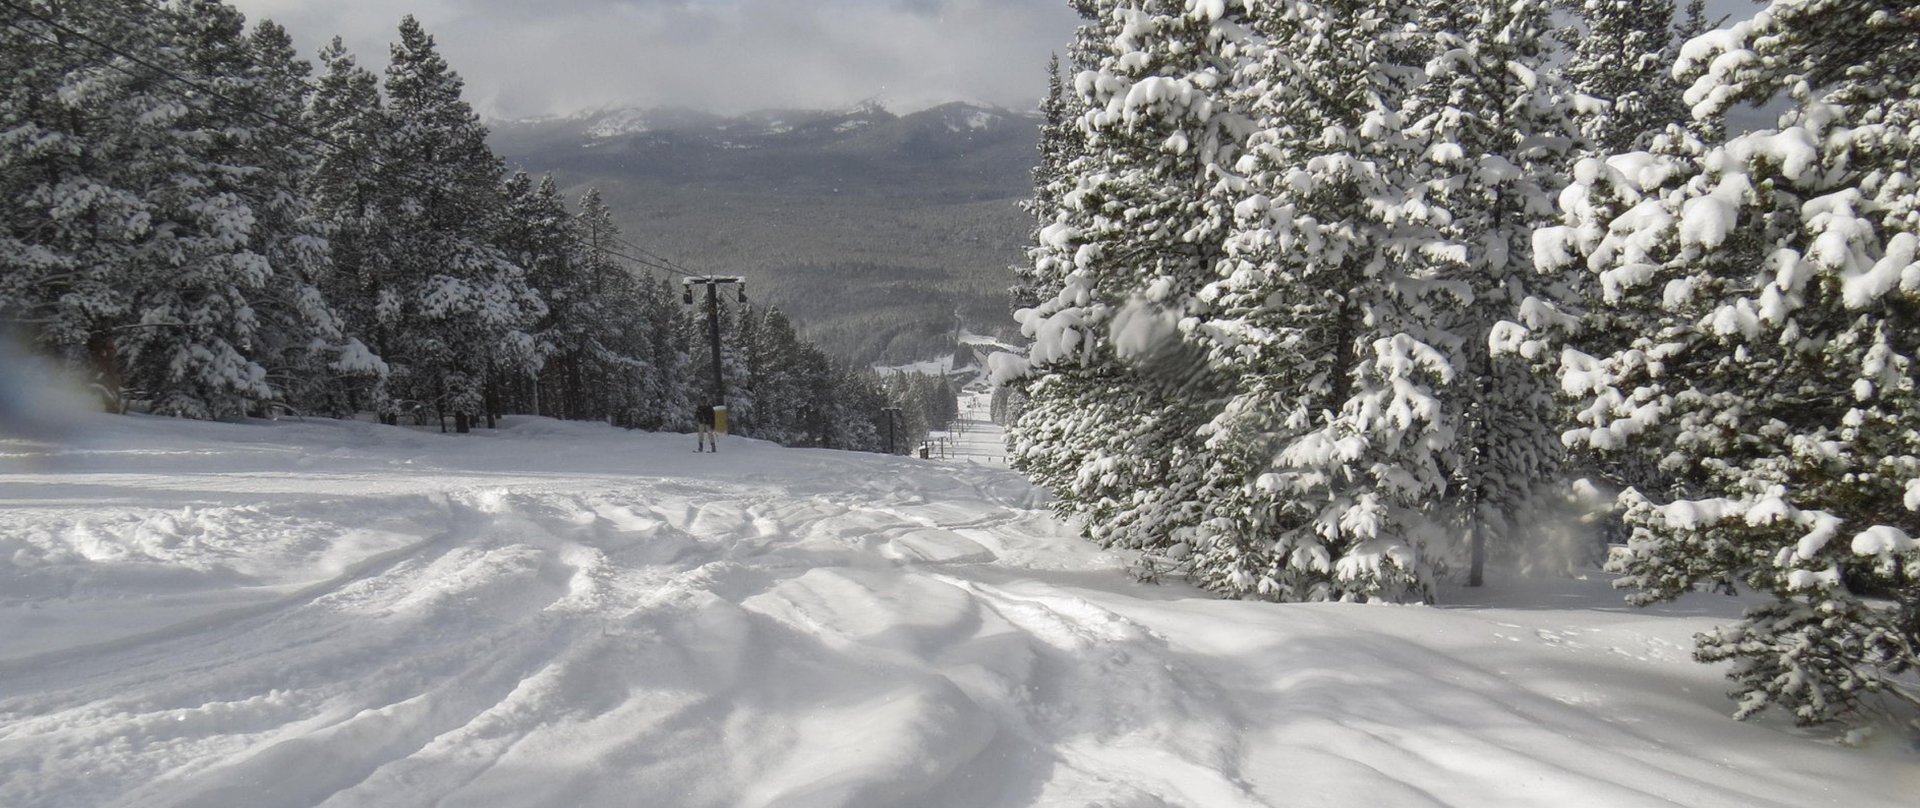 Deep powder on the slopes